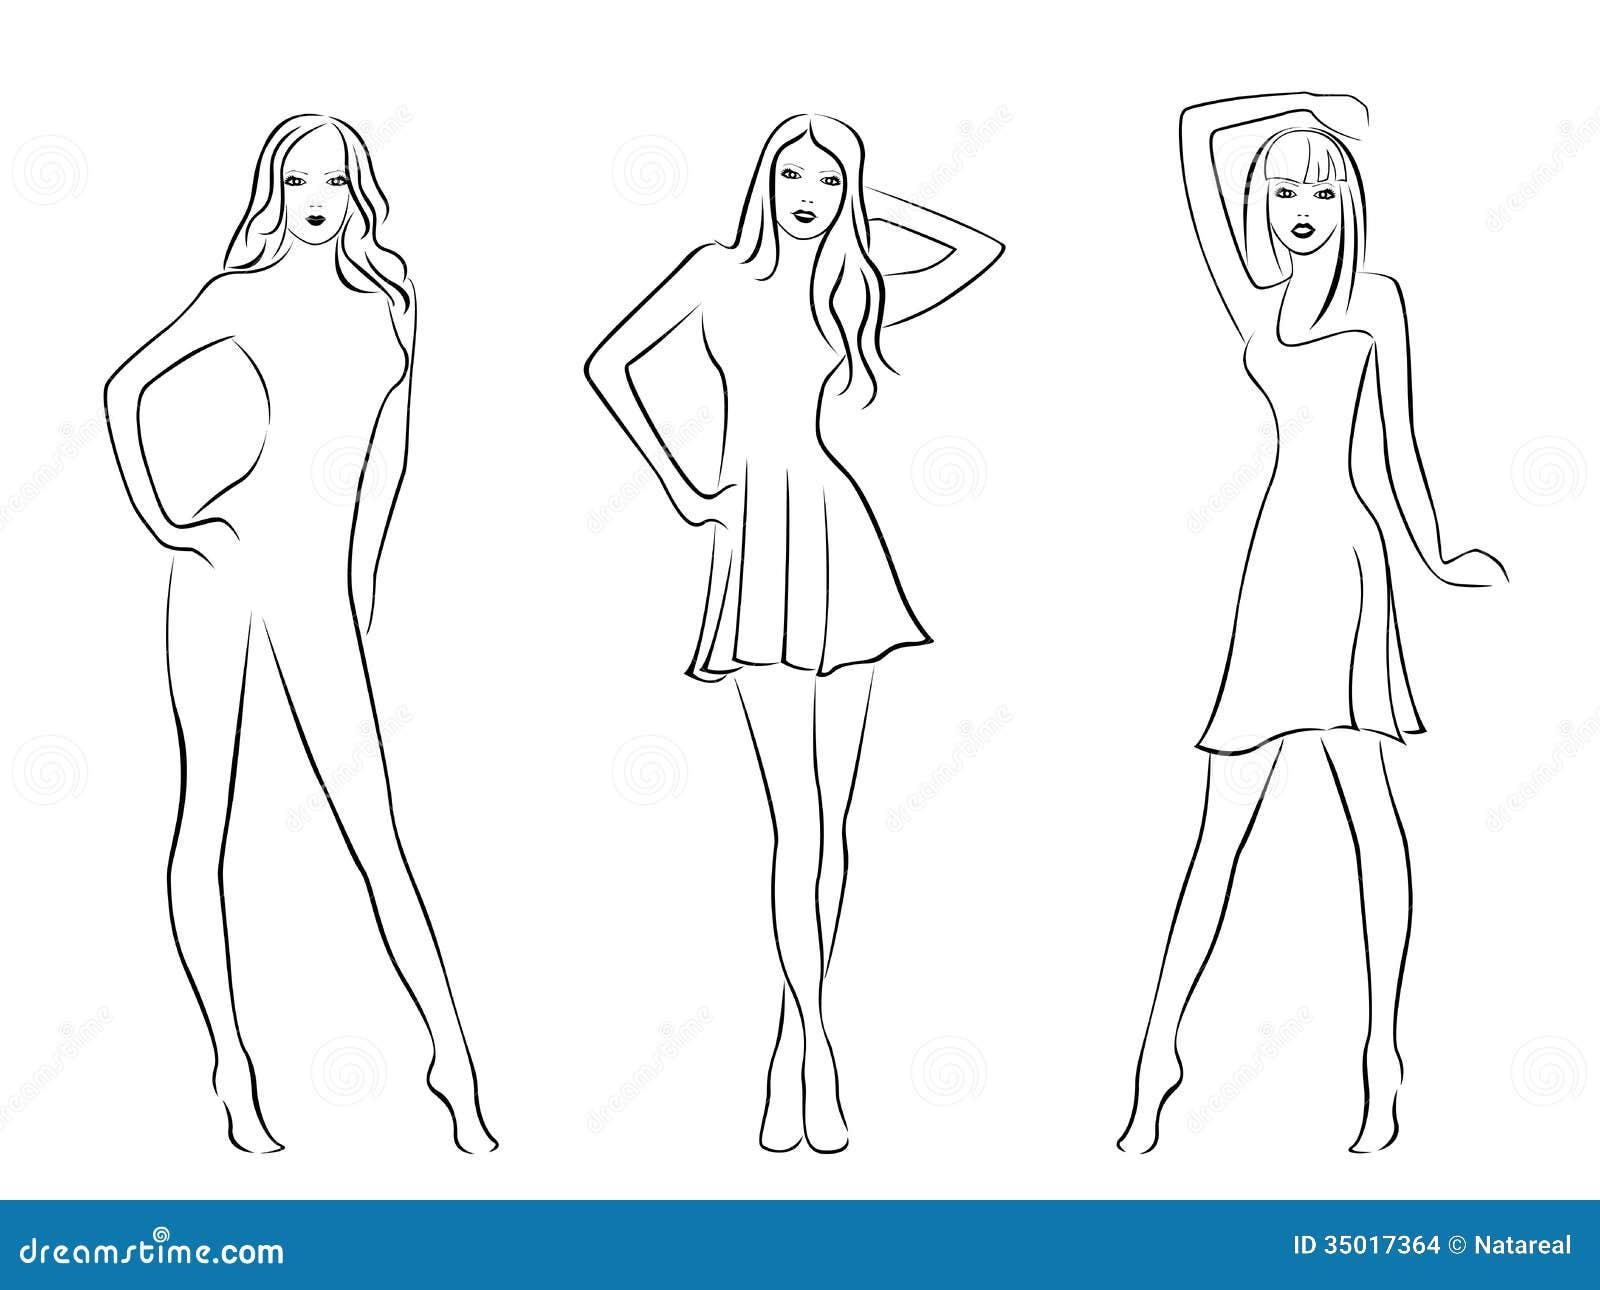 Eccezionale Figurini Di Moda Stilizzati JL46 » Regardsdefemmes RD84